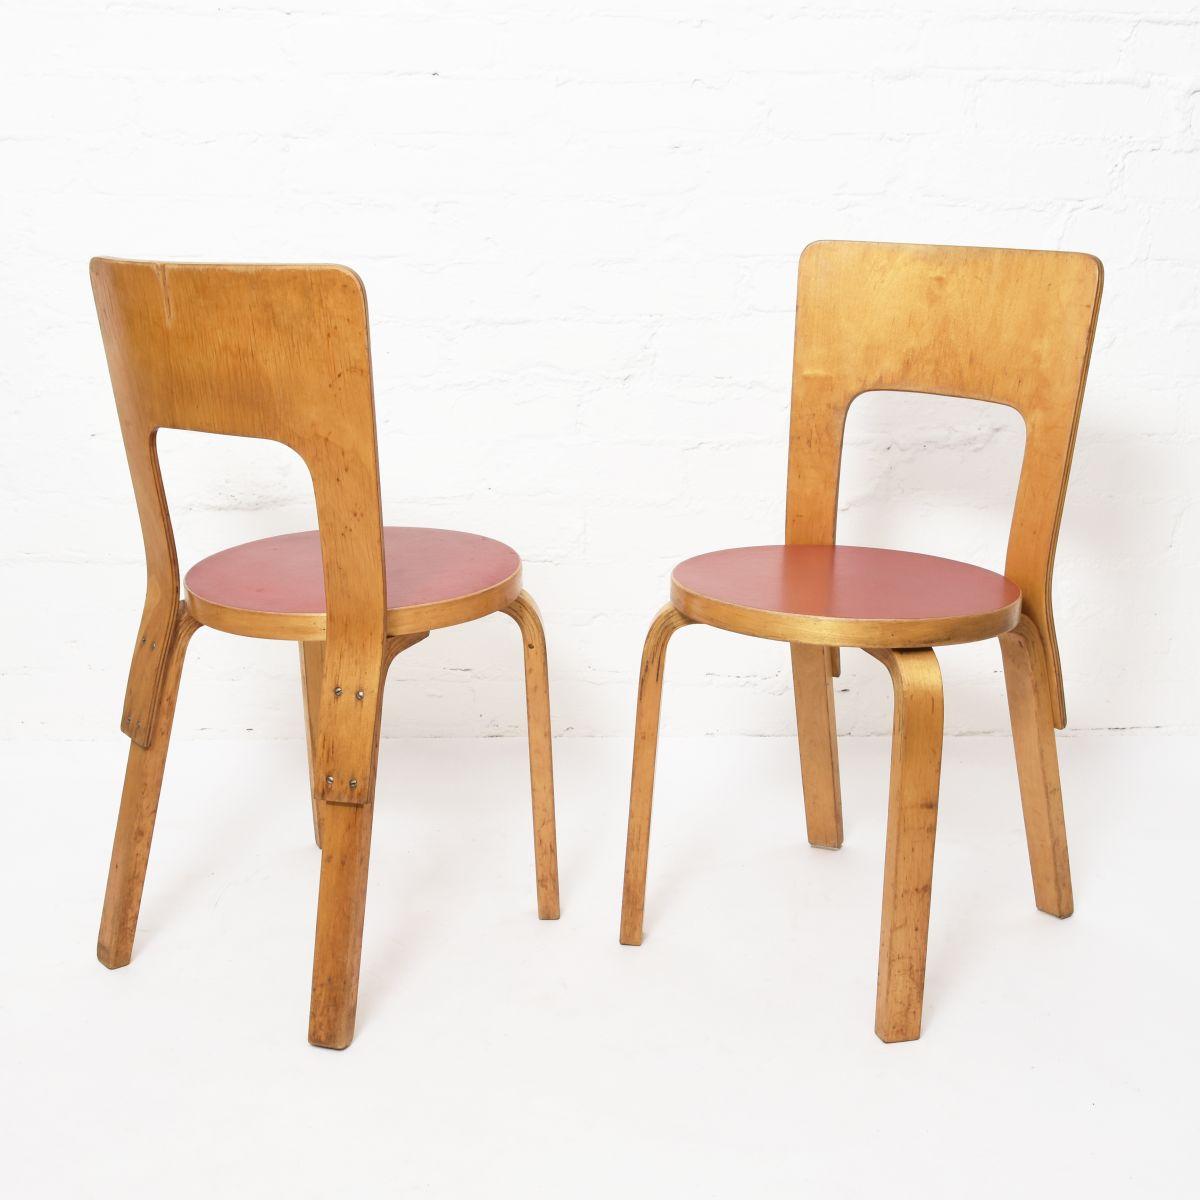 Aatlo-Alvar-Chair66-Red-Linoleum-three